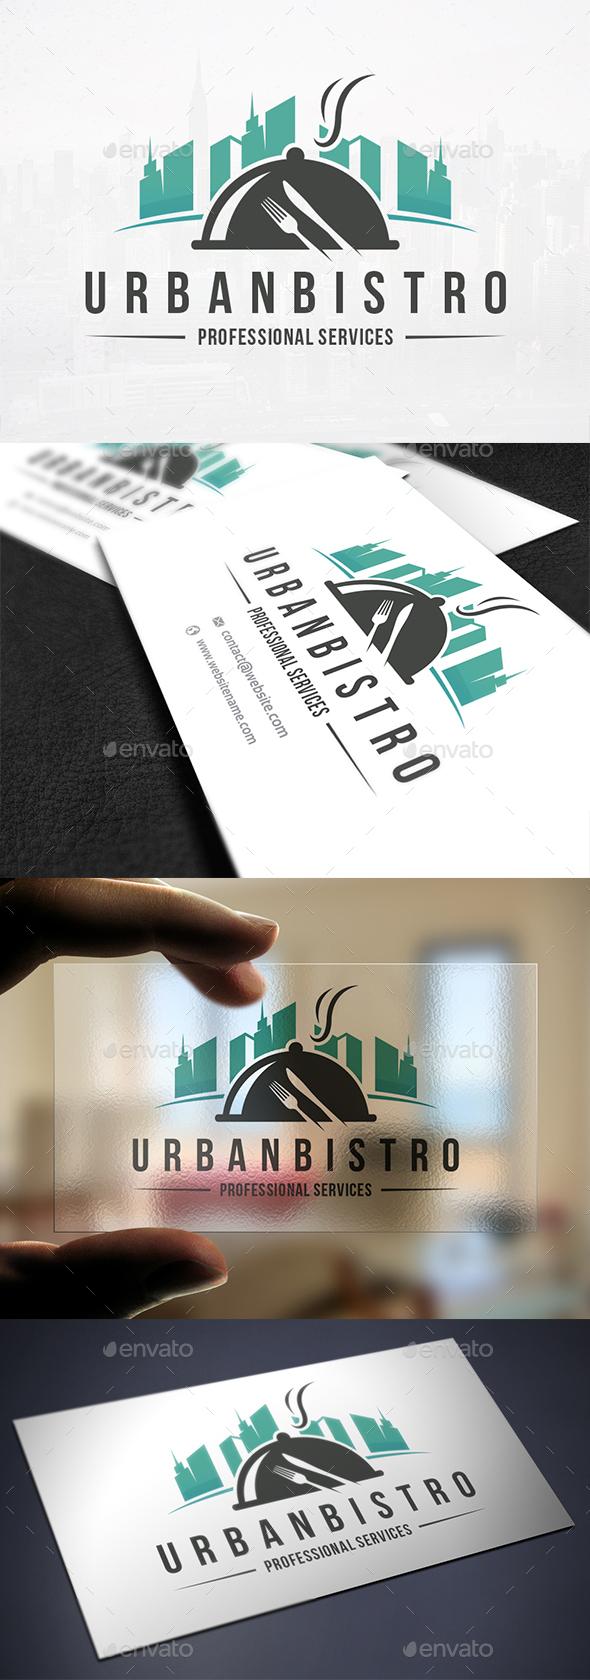 Urban Bistro Logo Template - Food Logo Templates